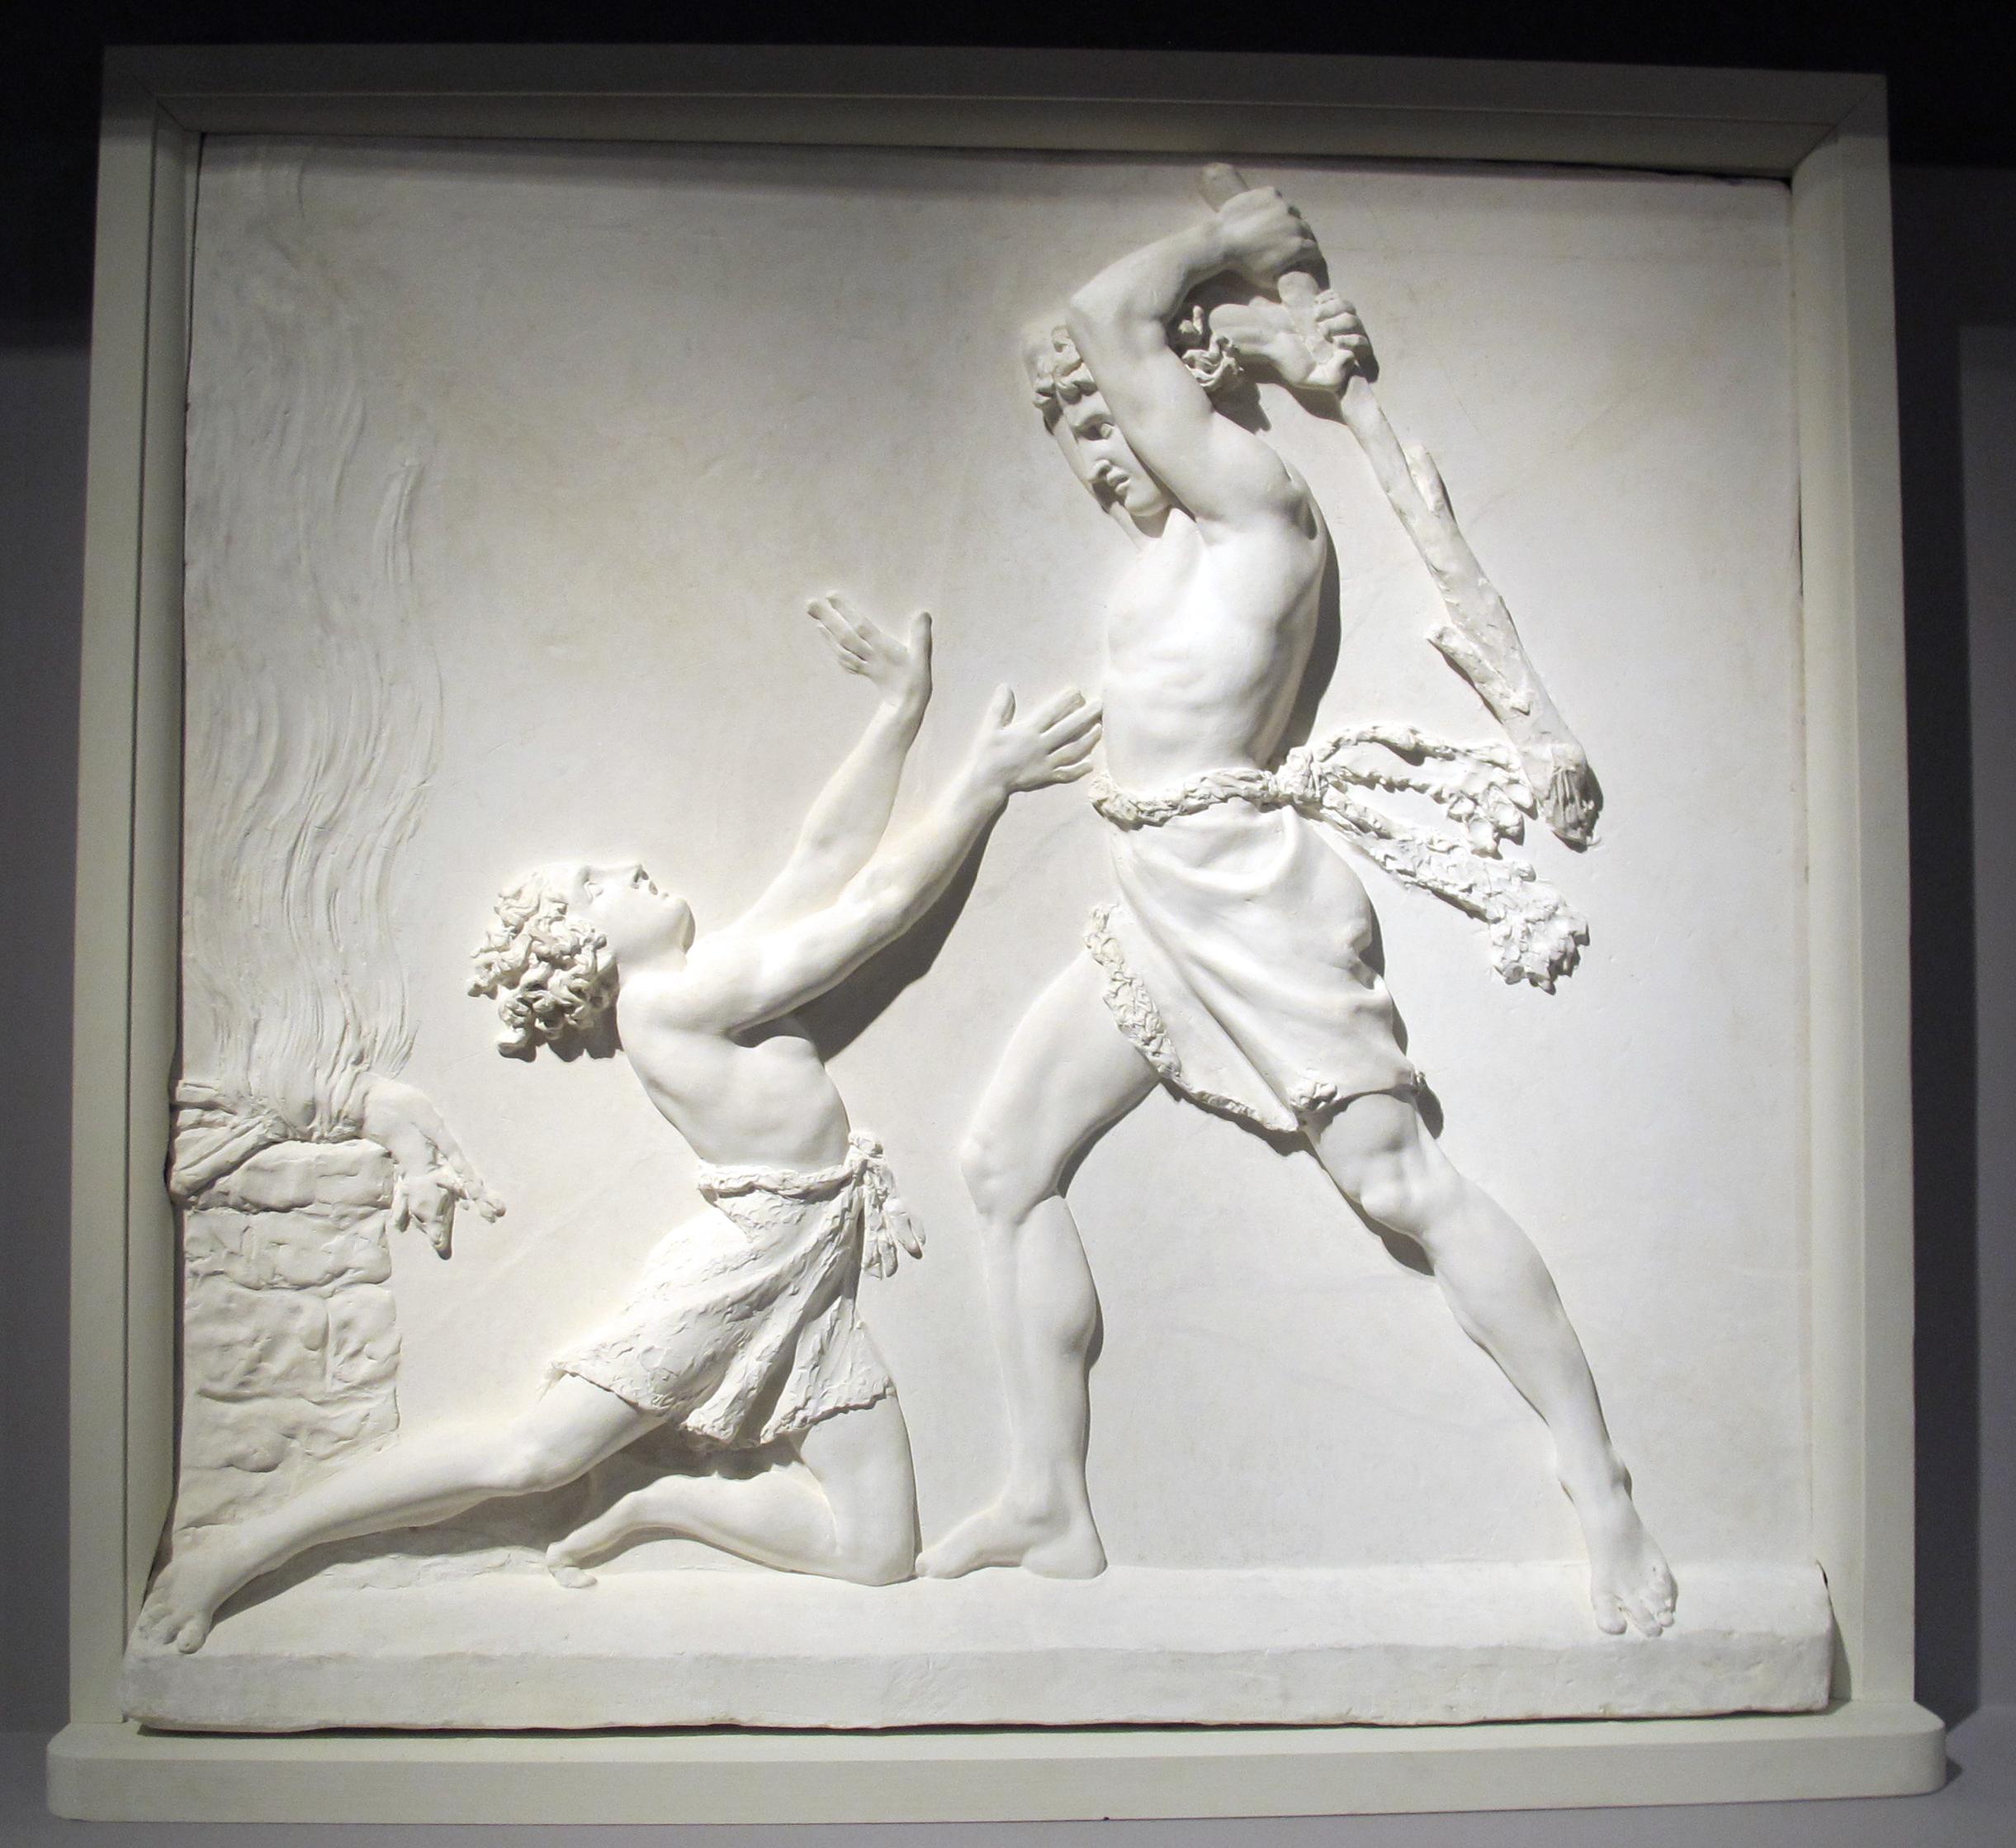 Caino e Abele, Antonio Canova, Venezia